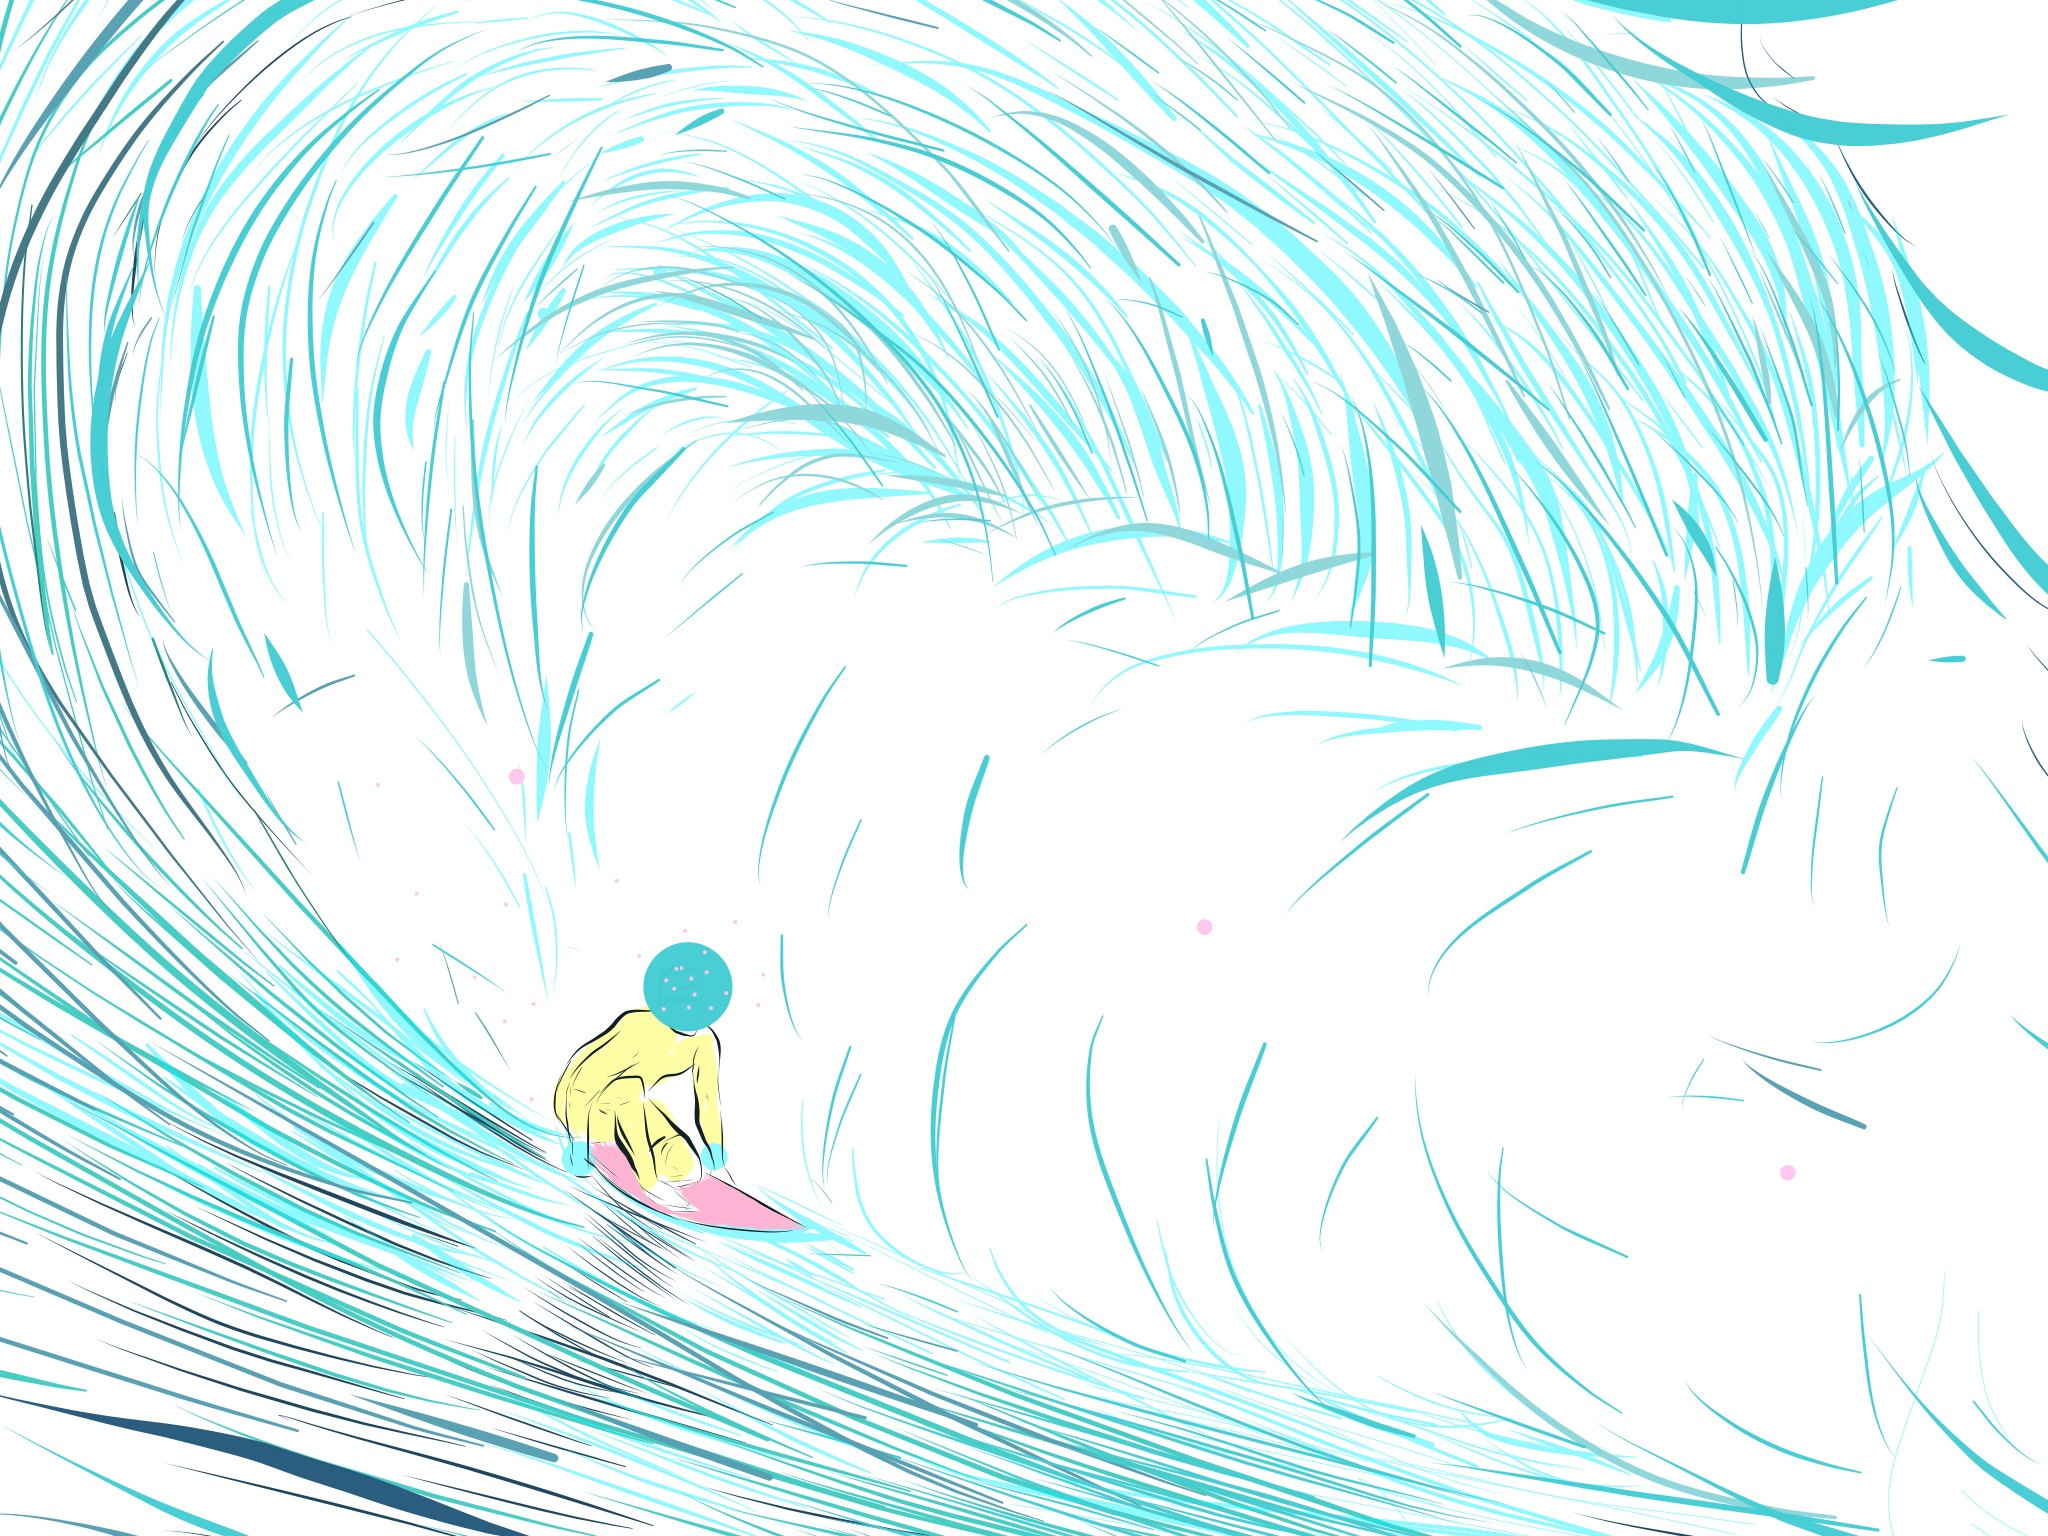 SURFMAN_02.JPG